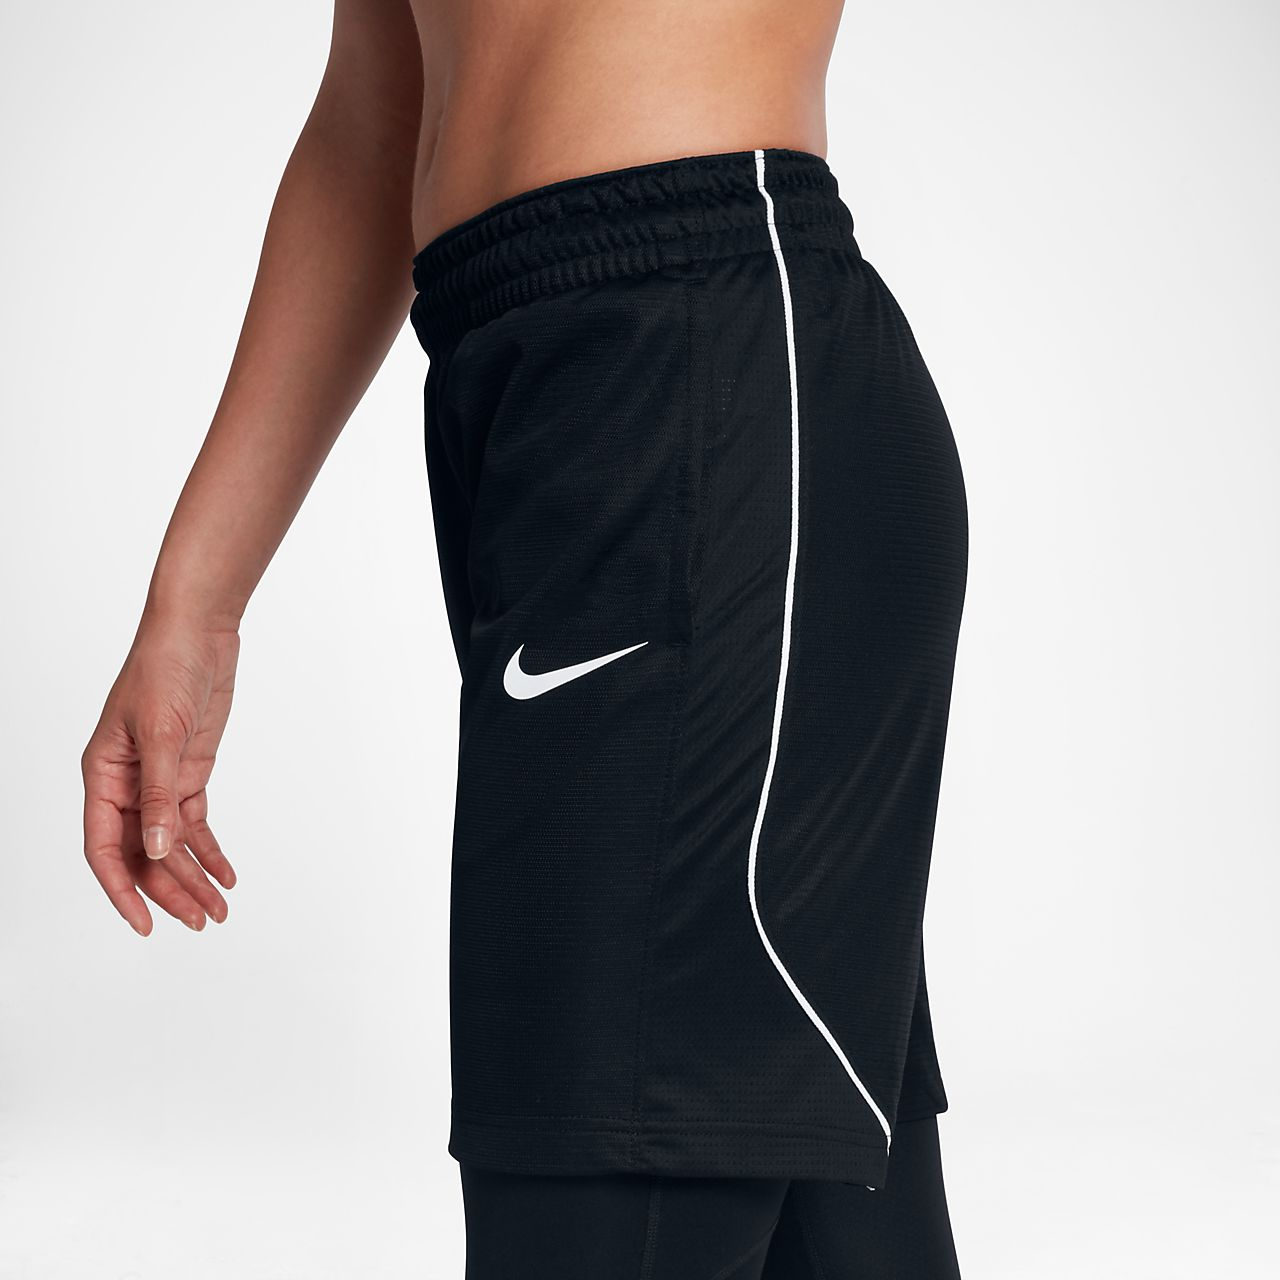 Mujer 5 25 Pantalón Baloncesto Cm Dry Essential Corto Nike De WDE9IY2H